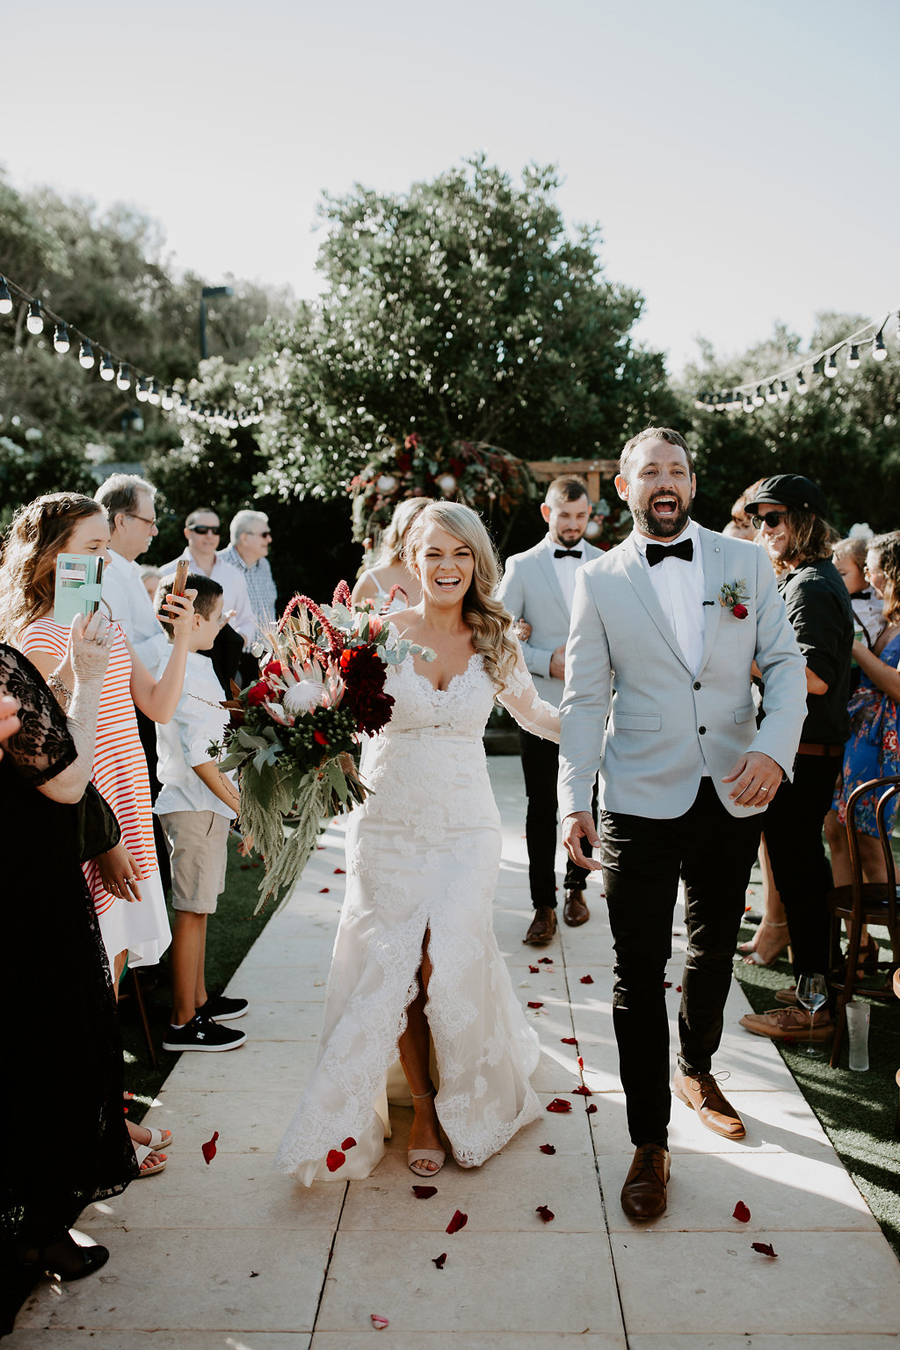 osteria-casuarina-wedding-venue-tweed-coast-weddings-coastal-garden-reception-real-wedding021.jpg